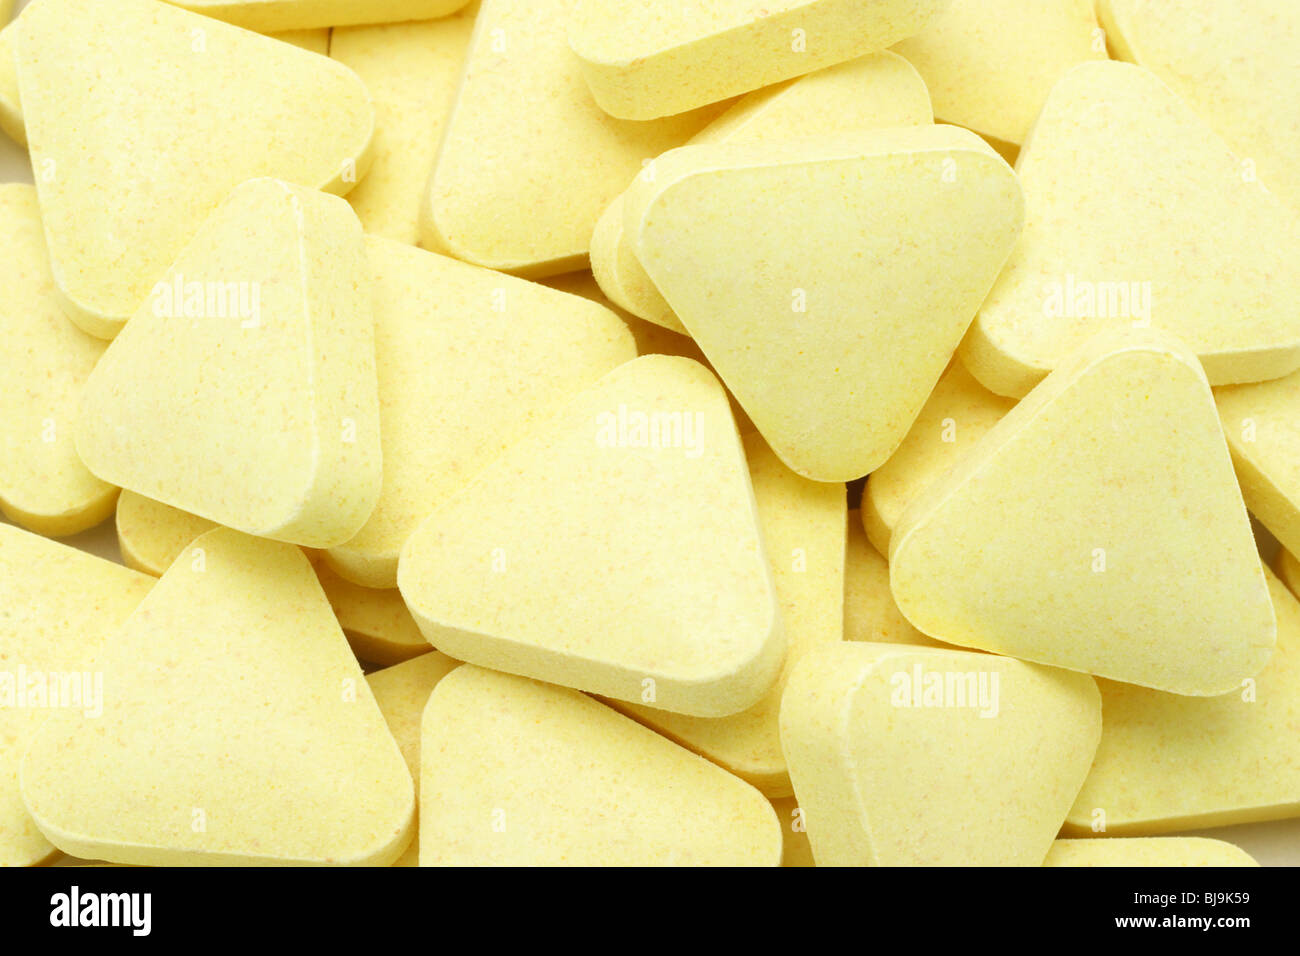 Yellow Color Stockfotos & Yellow Color Bilder - Alamy